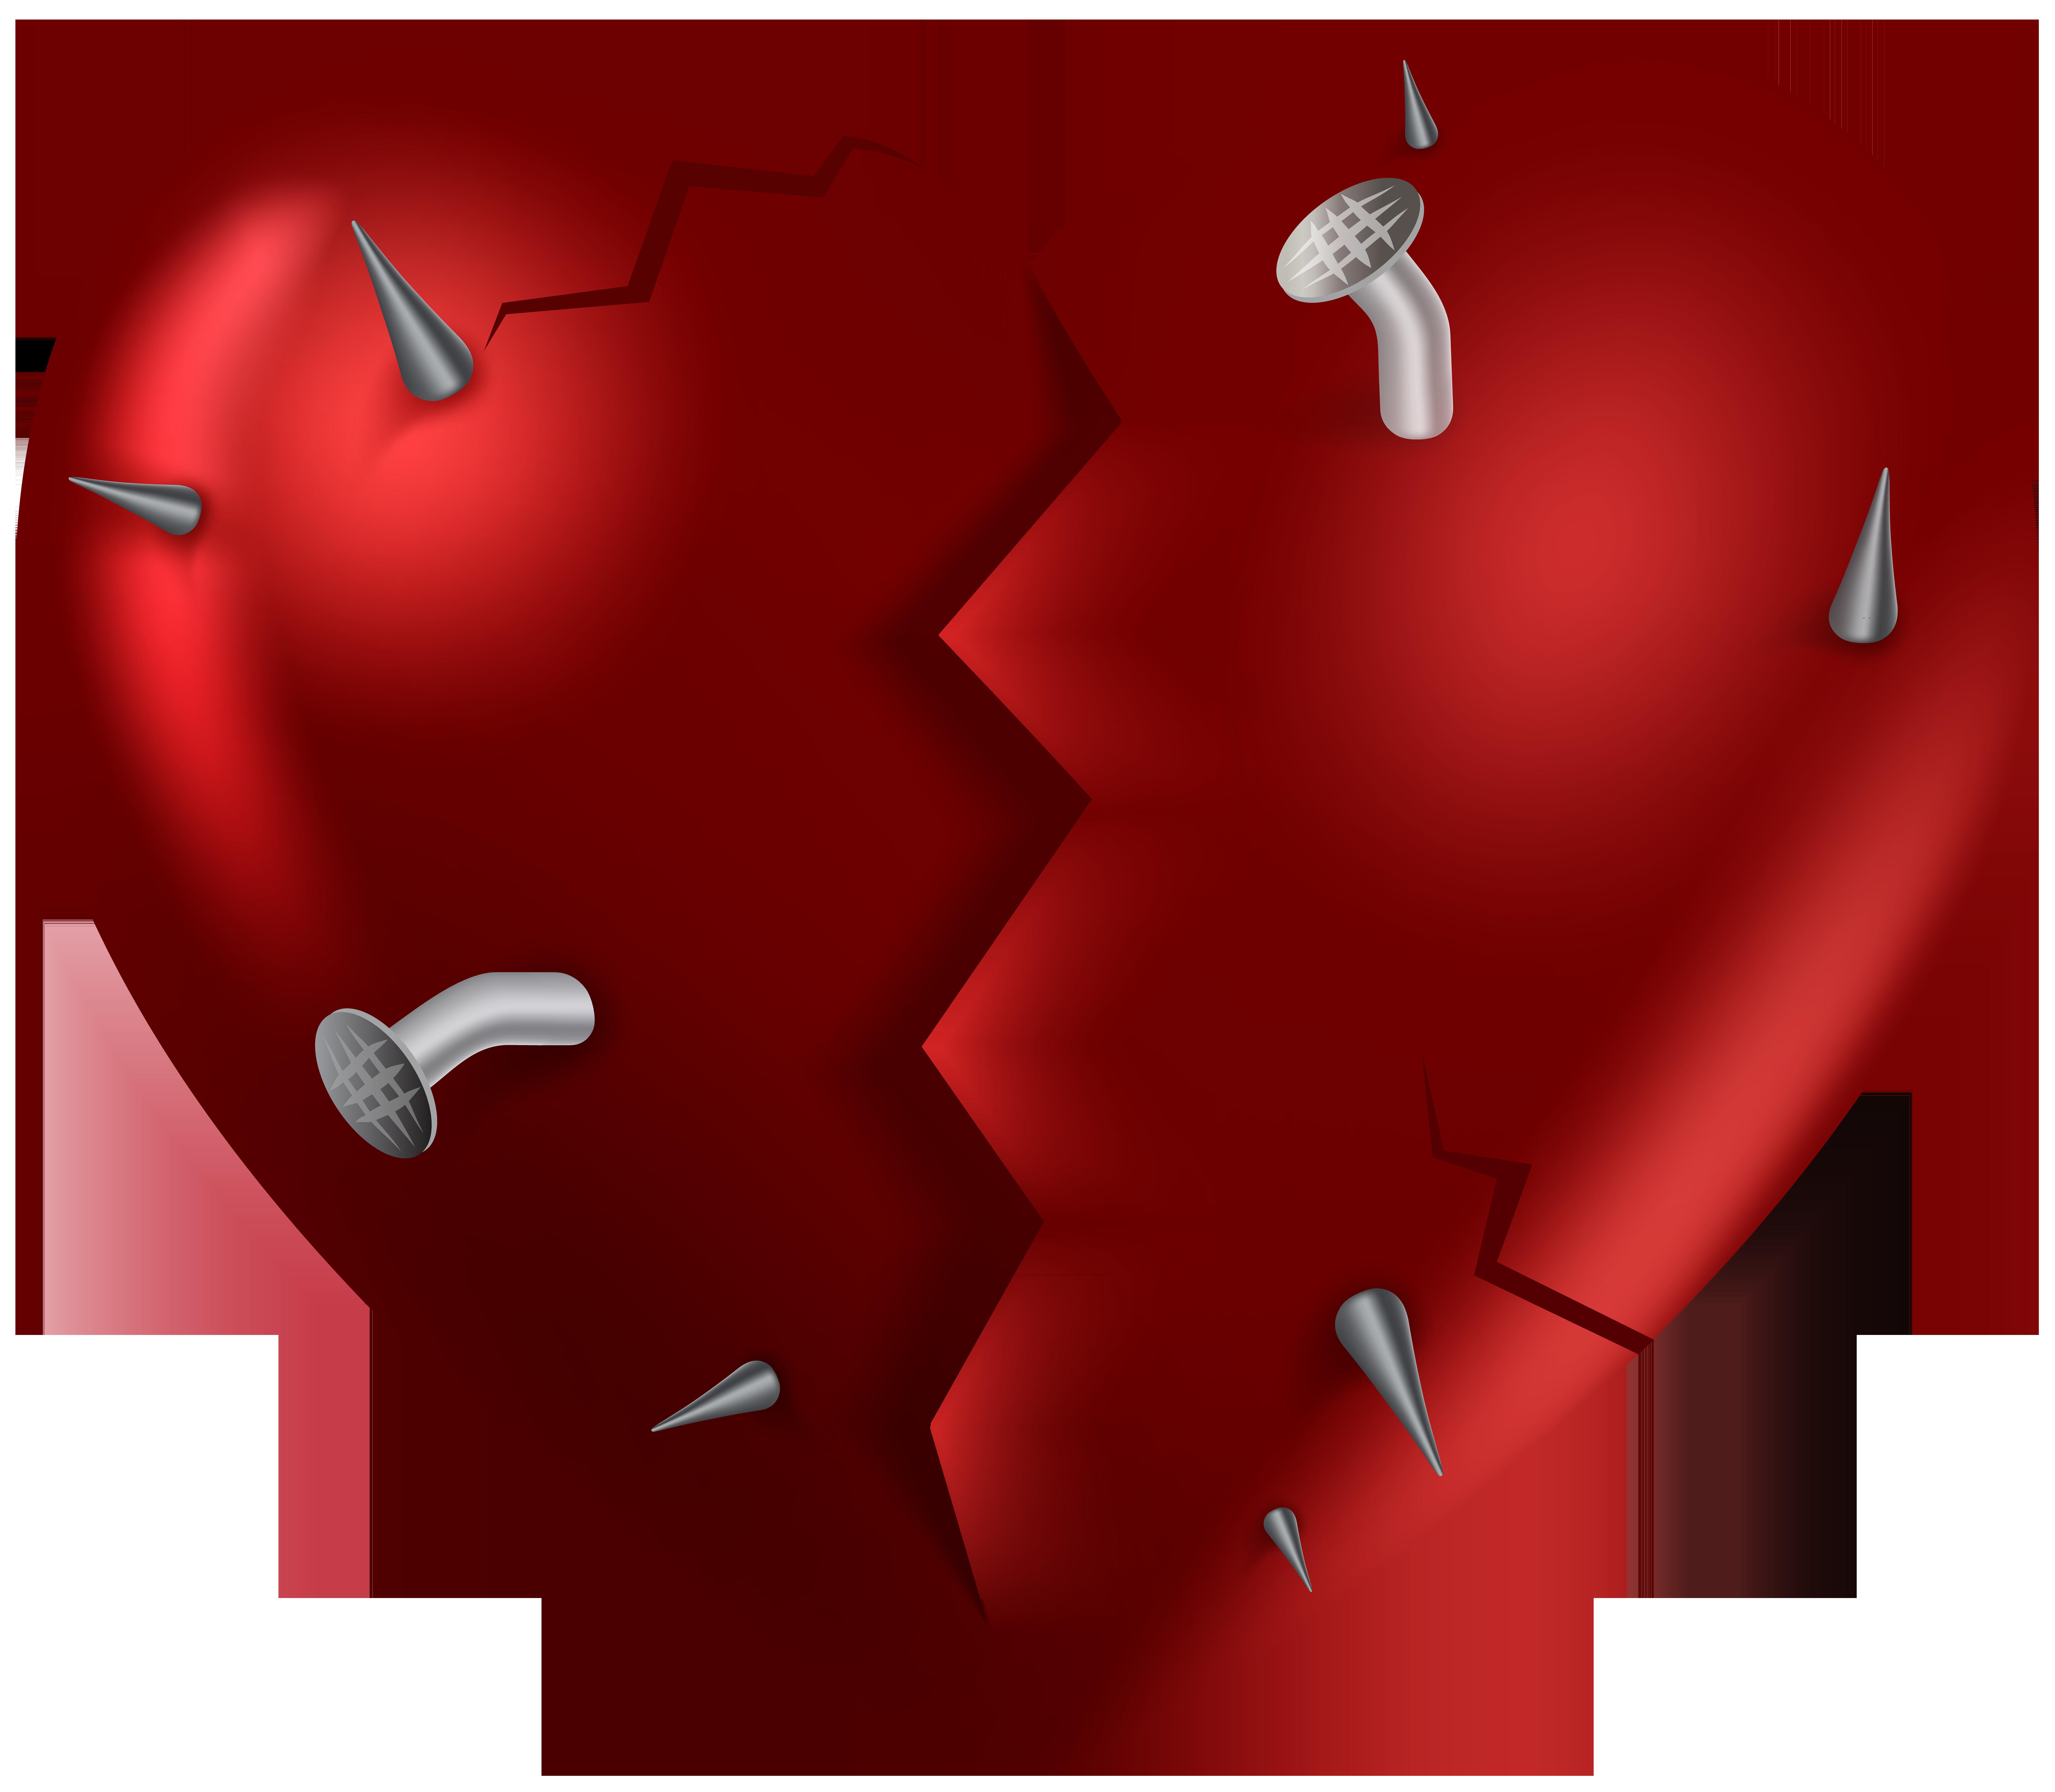 Heart broken clipart picture transparent library Broken Heart Clipart | Free download best Broken Heart Clipart on ... picture transparent library